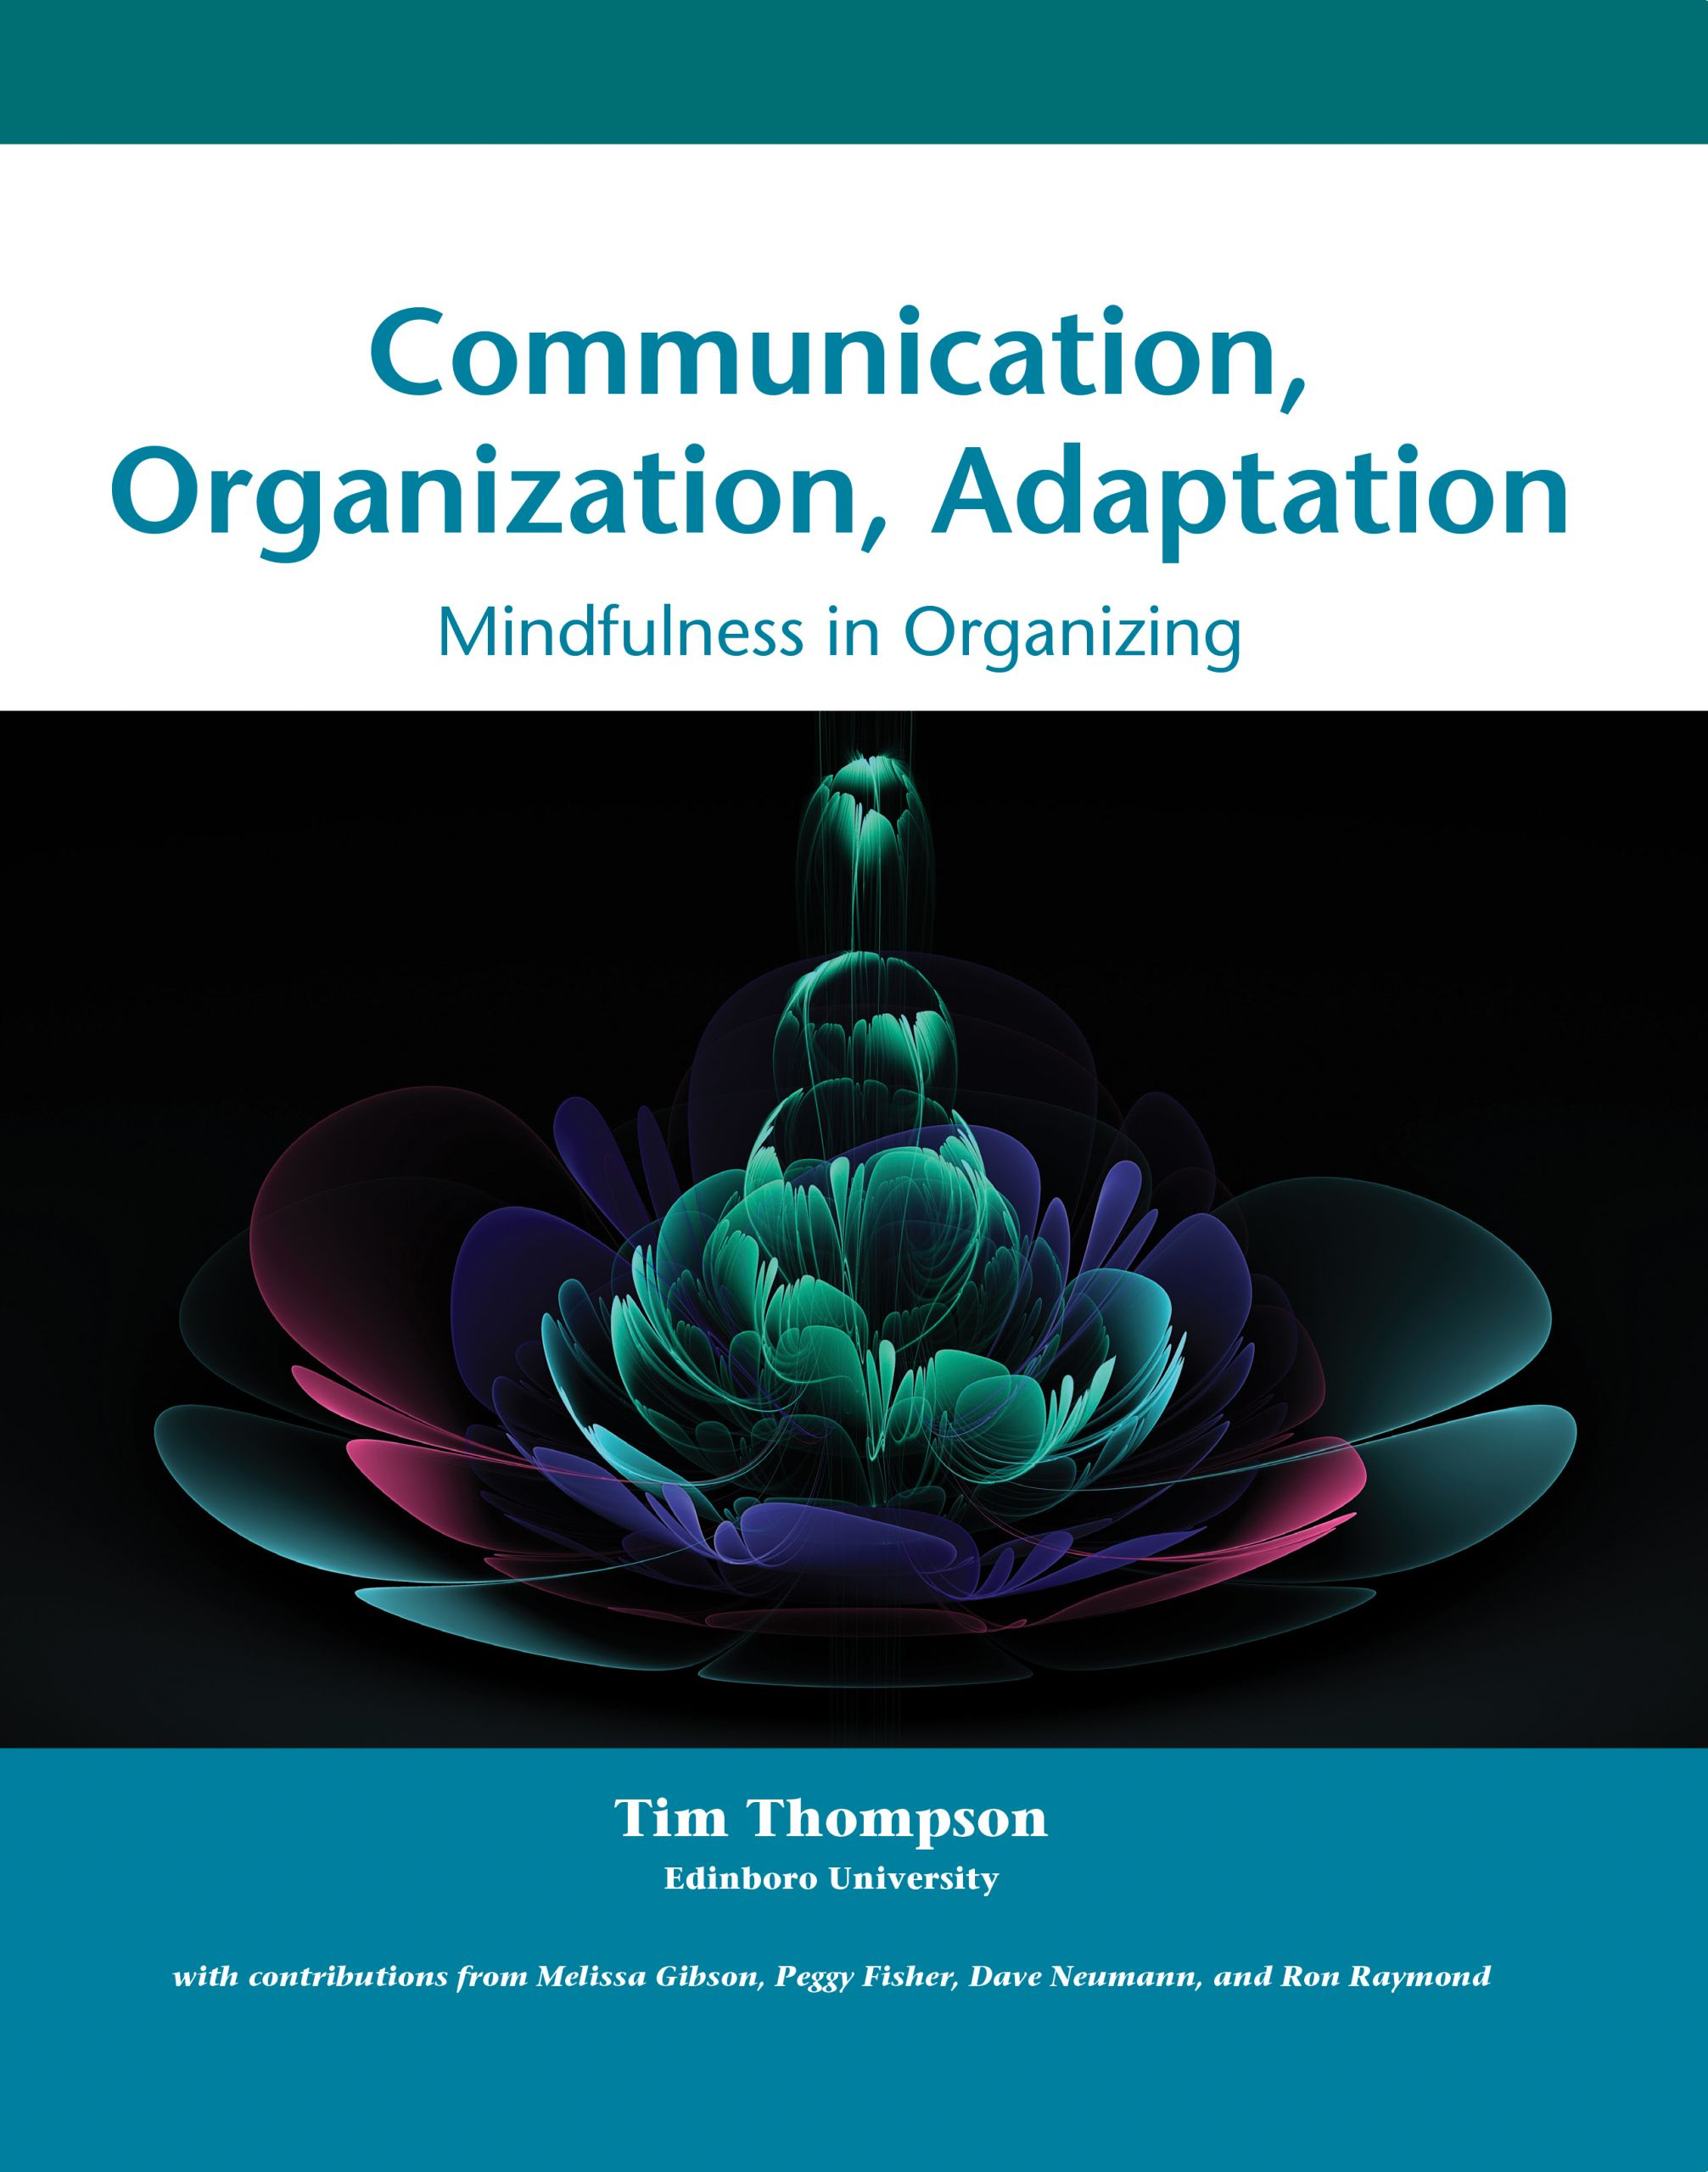 Communication, Organization, Adaptation cover